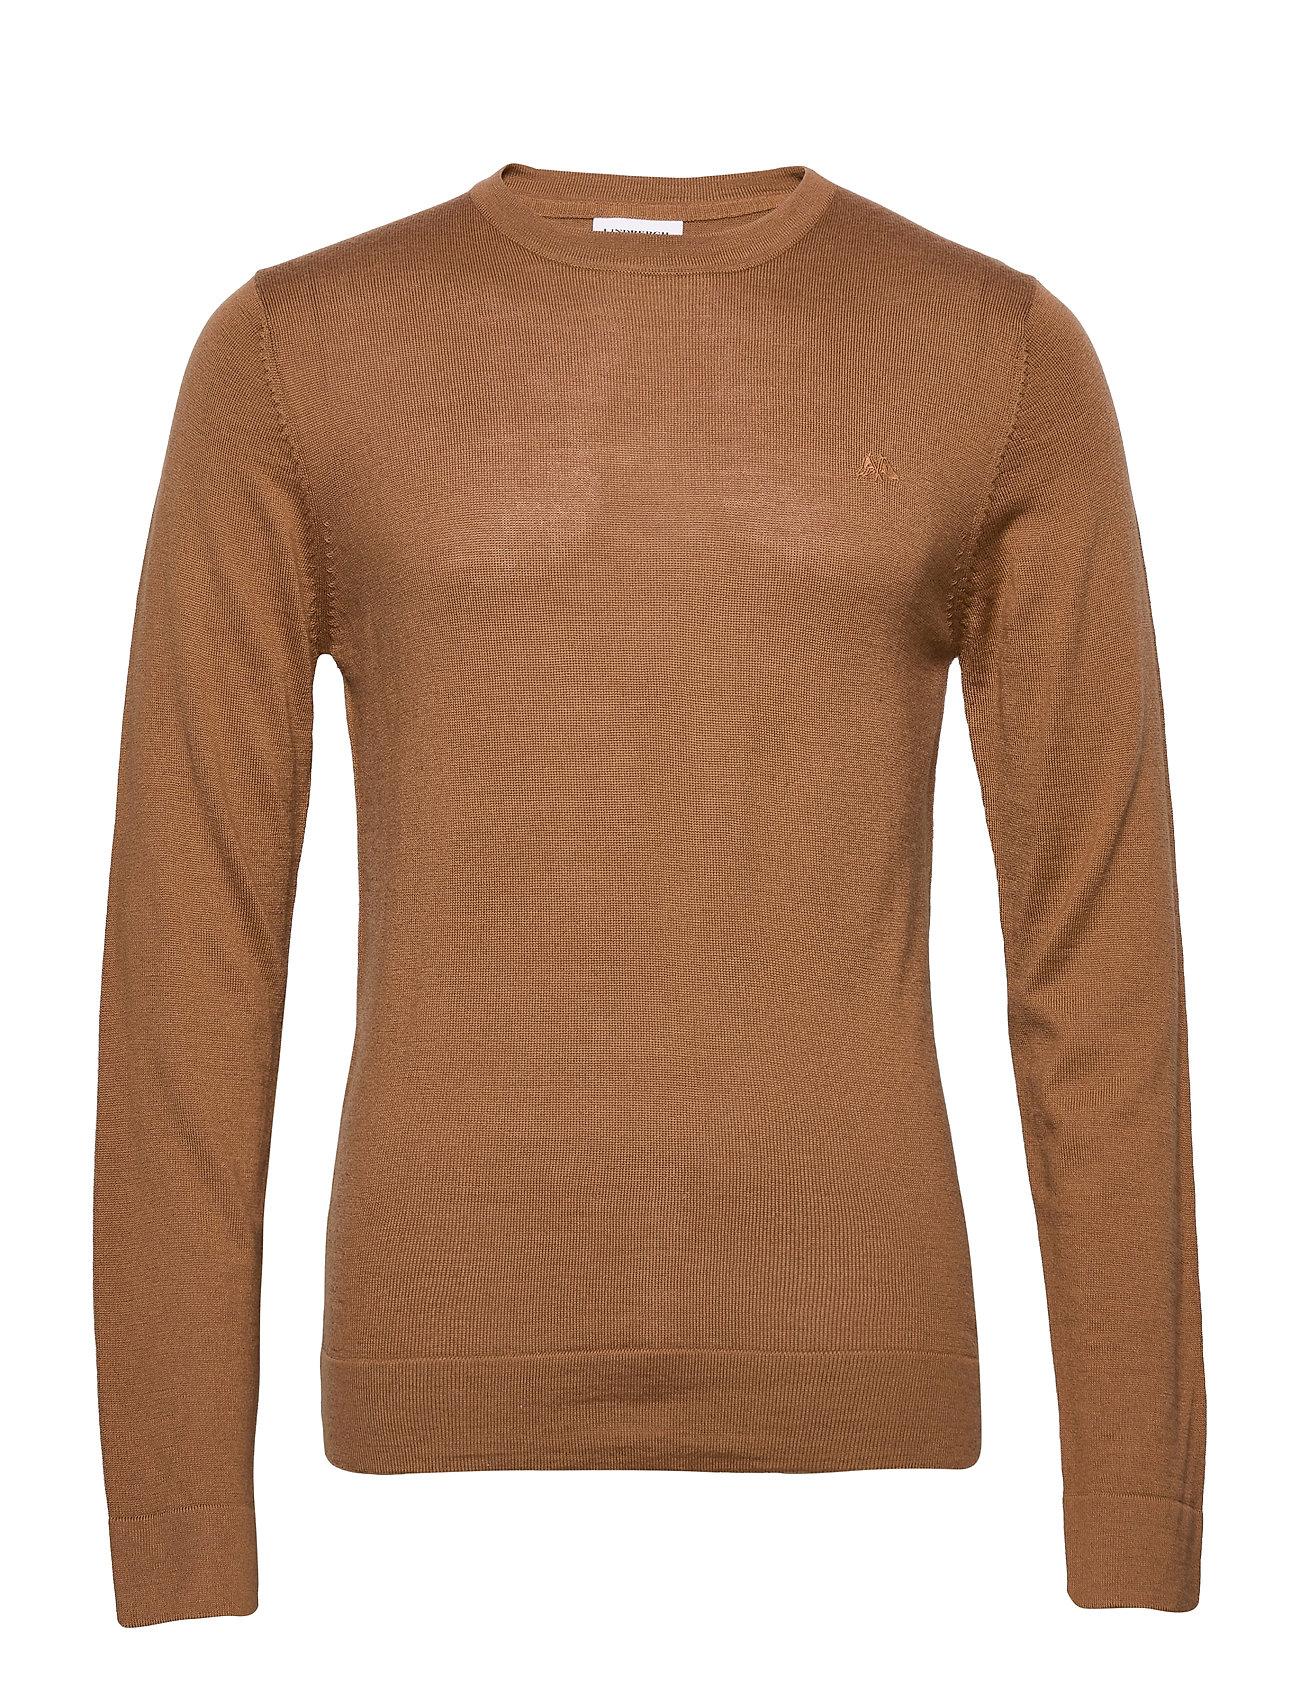 Lindbergh Merino knit o-neck - DK CAMEL